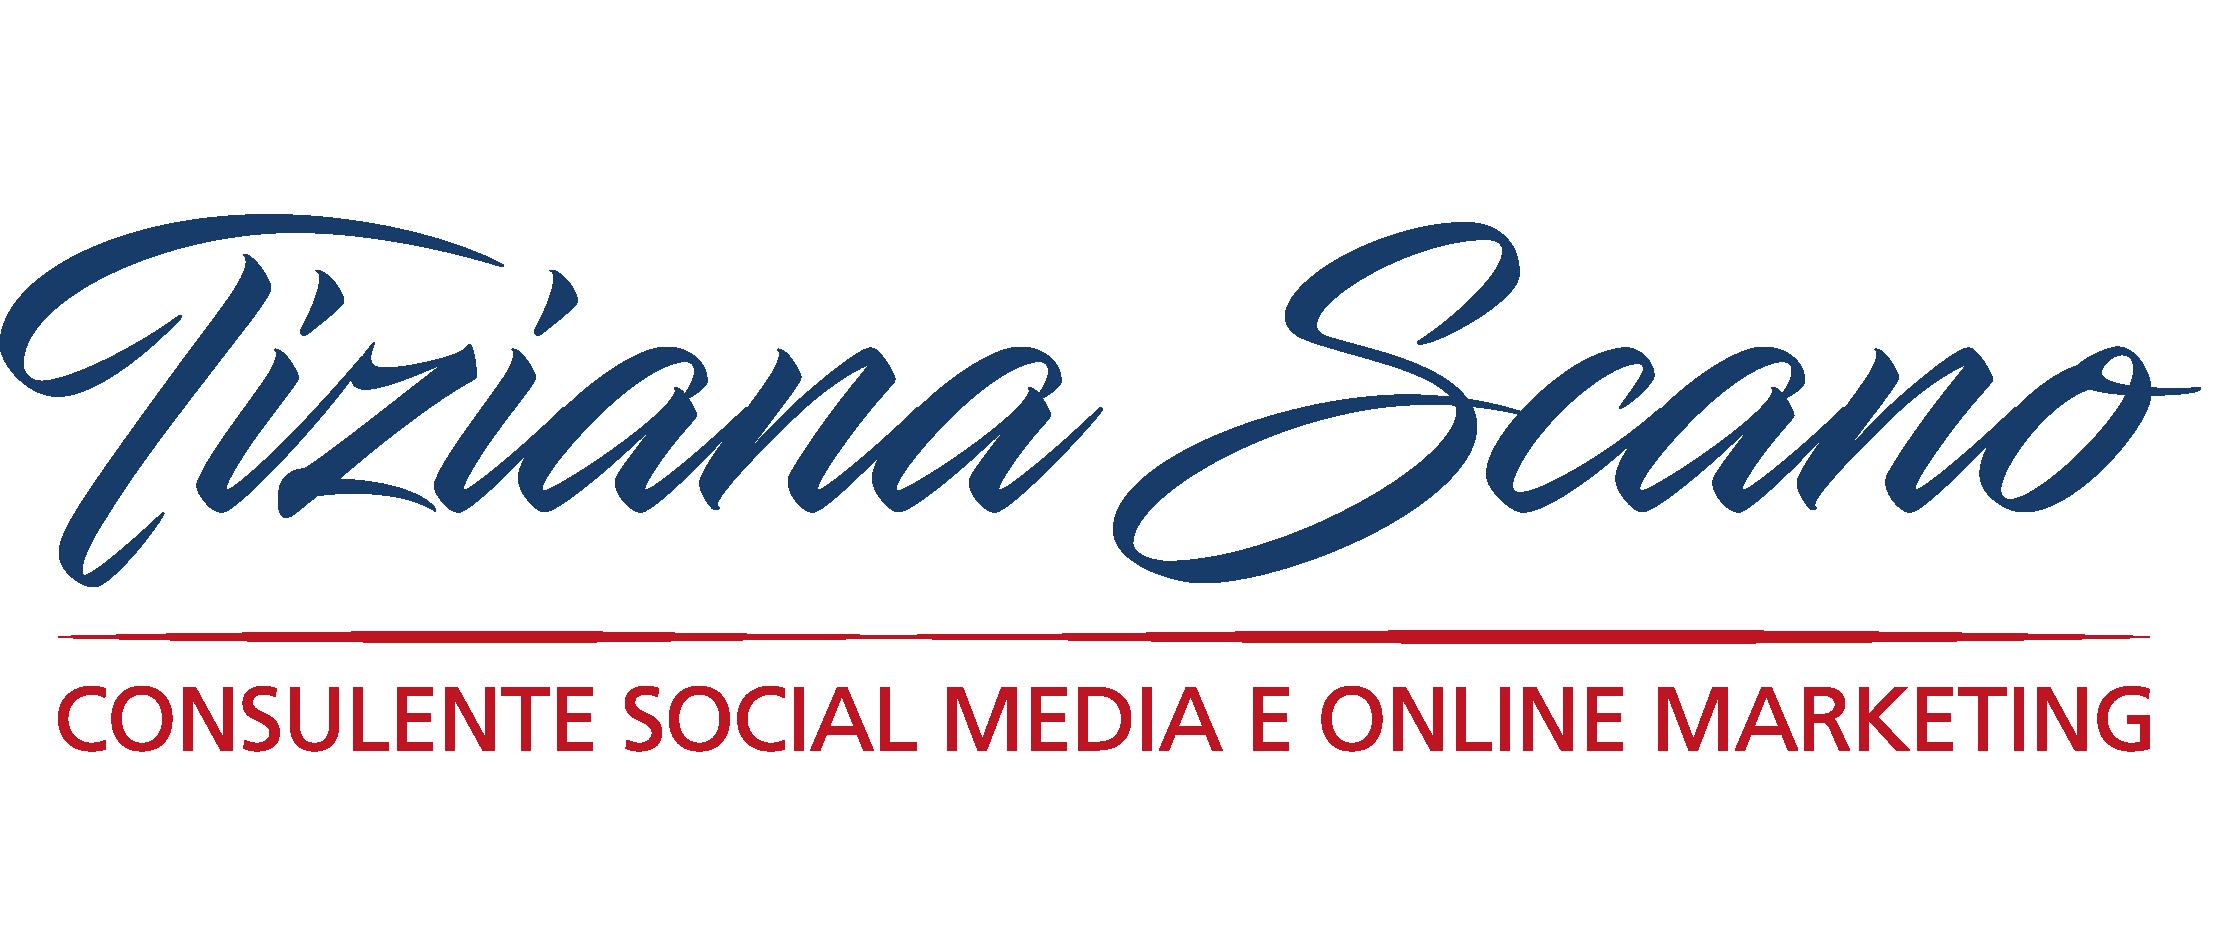 Social Media e Online Marketing